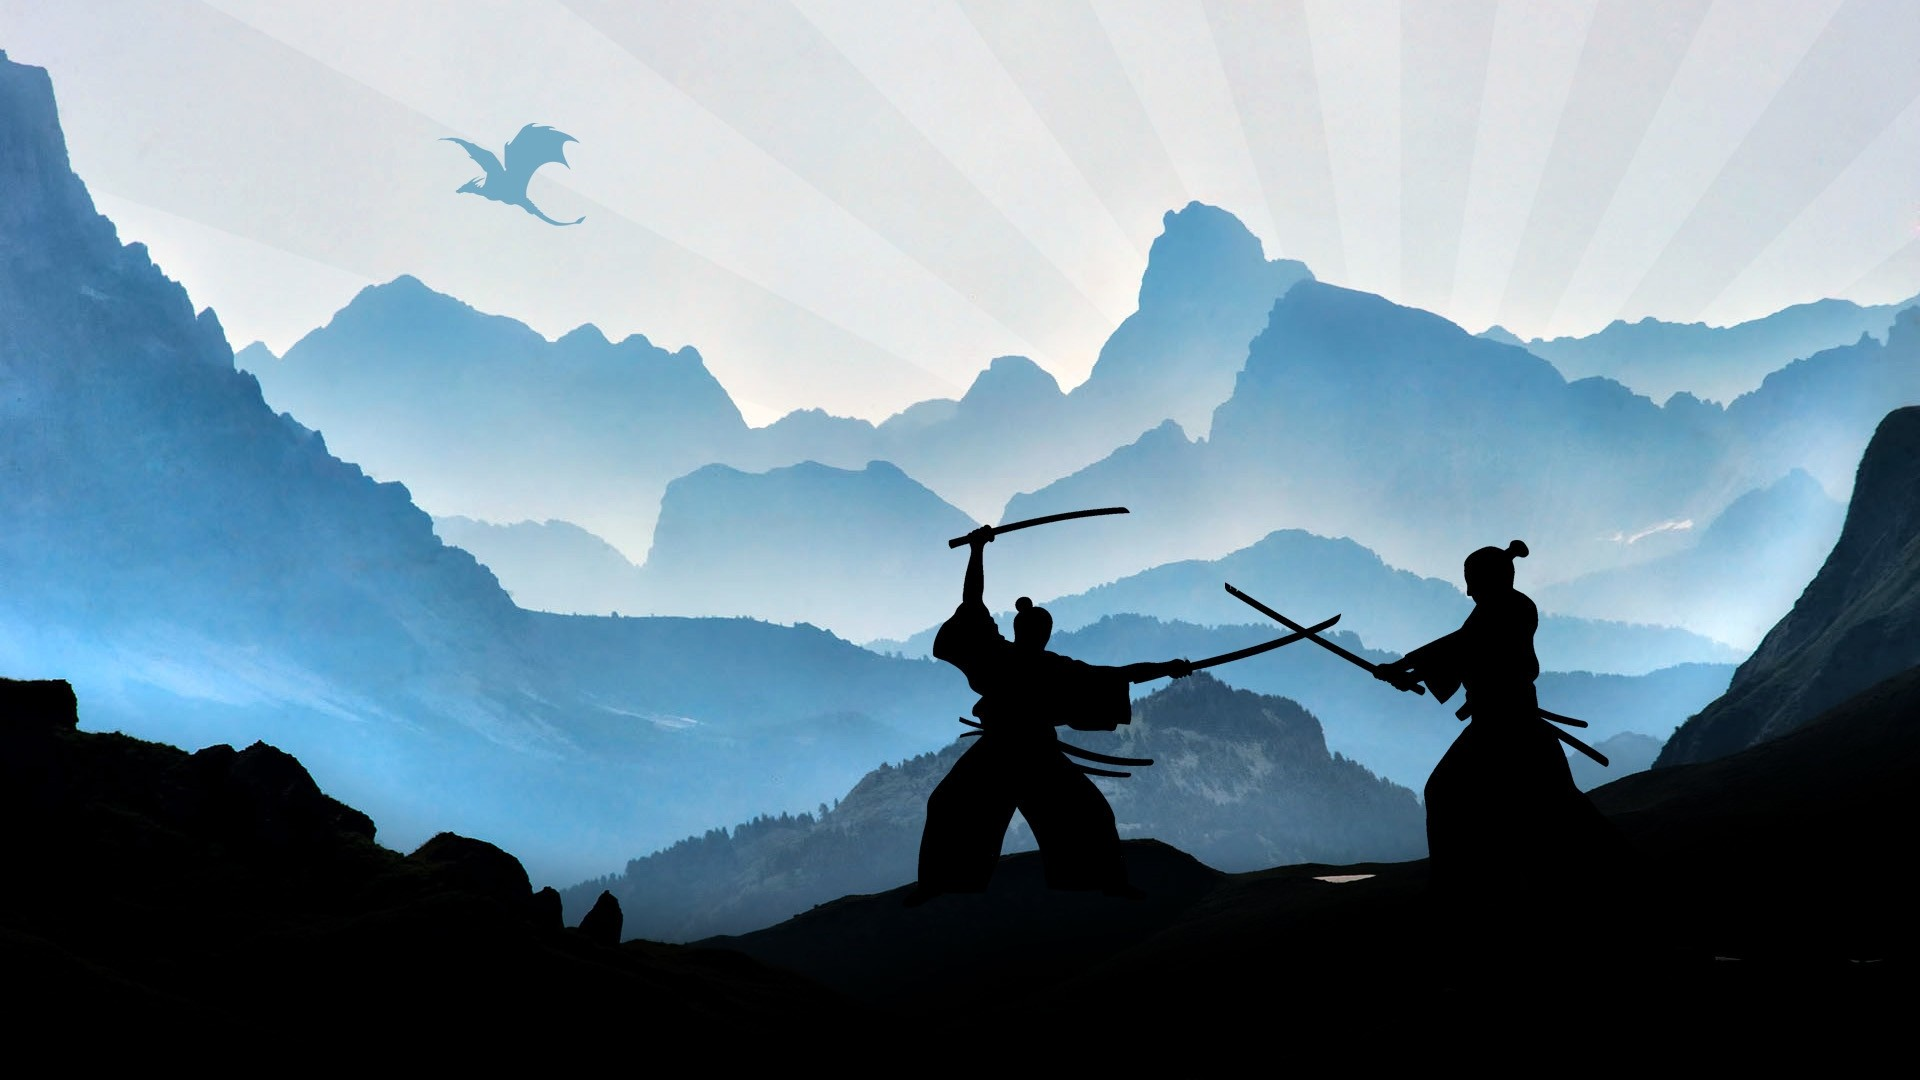 Samurai Free Wallpaper and Background